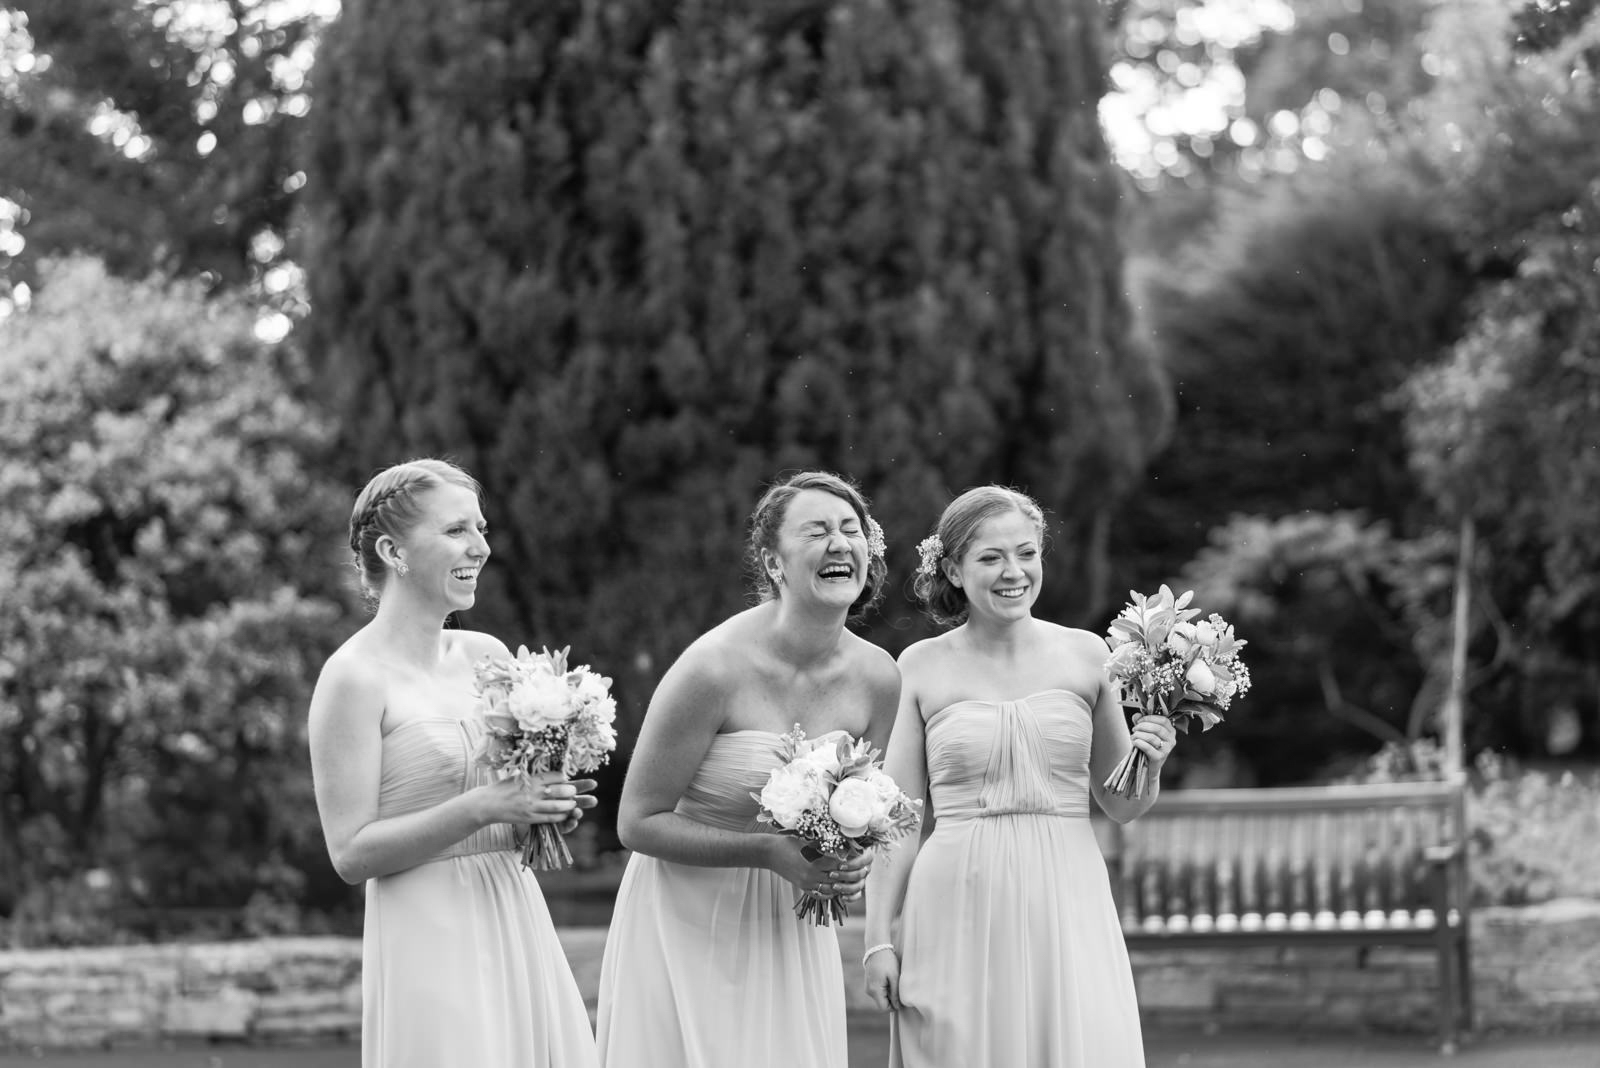 bridesmaids-fun-scottish-wedding-glasgow-scotland(1).jpg